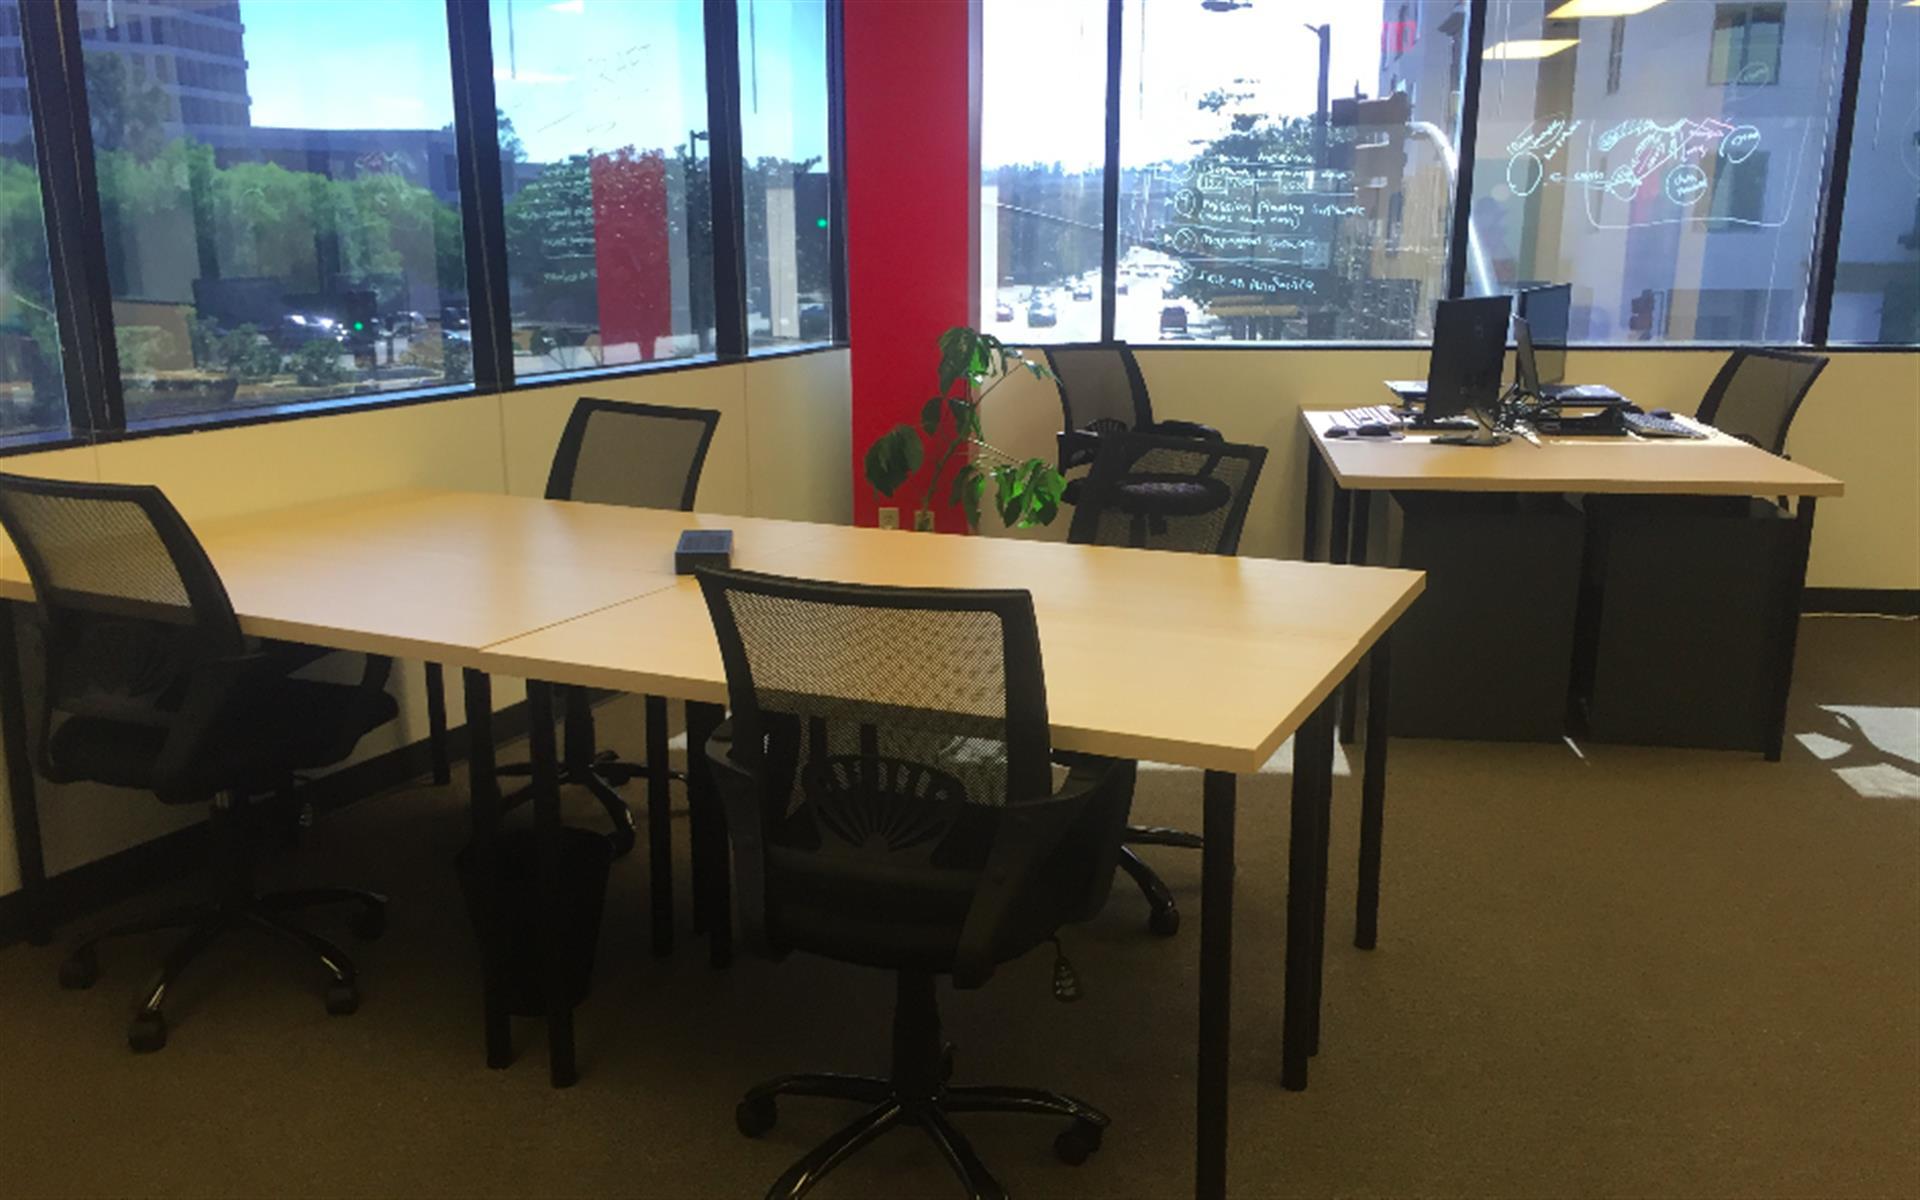 Spacecraft - Dedicated Desk